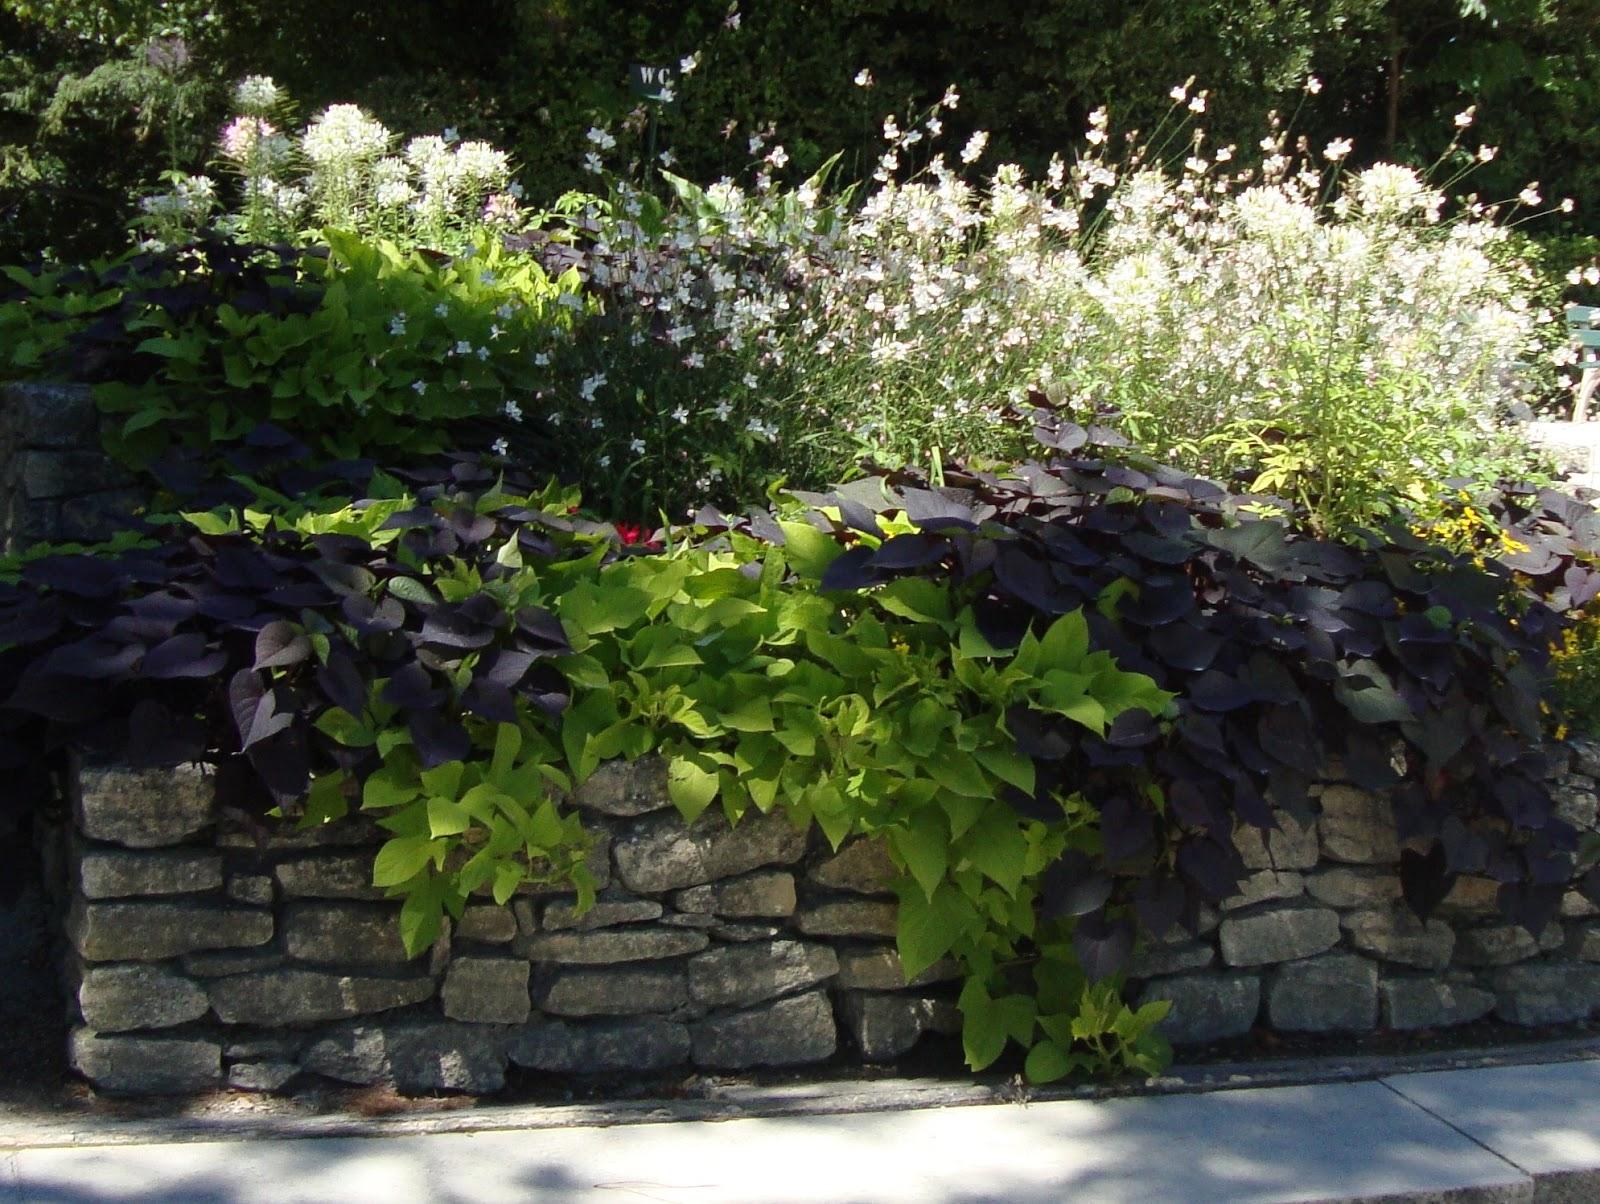 Un piccolo giardino in citt dalla francia citt e paesi - Sistemare un giardino ...